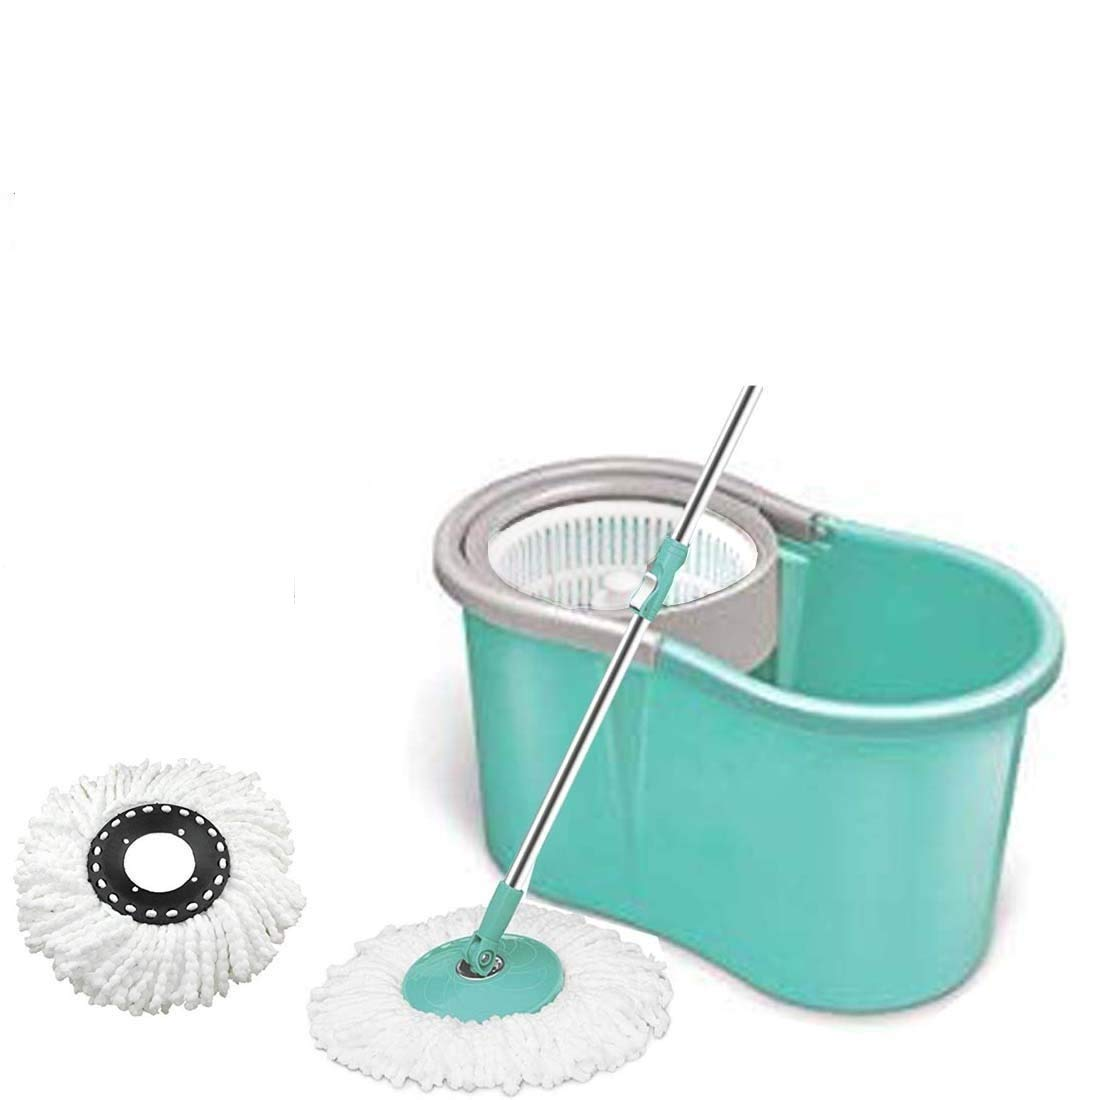 Mop'n'me 360 Spin Floor Cleaning Mop